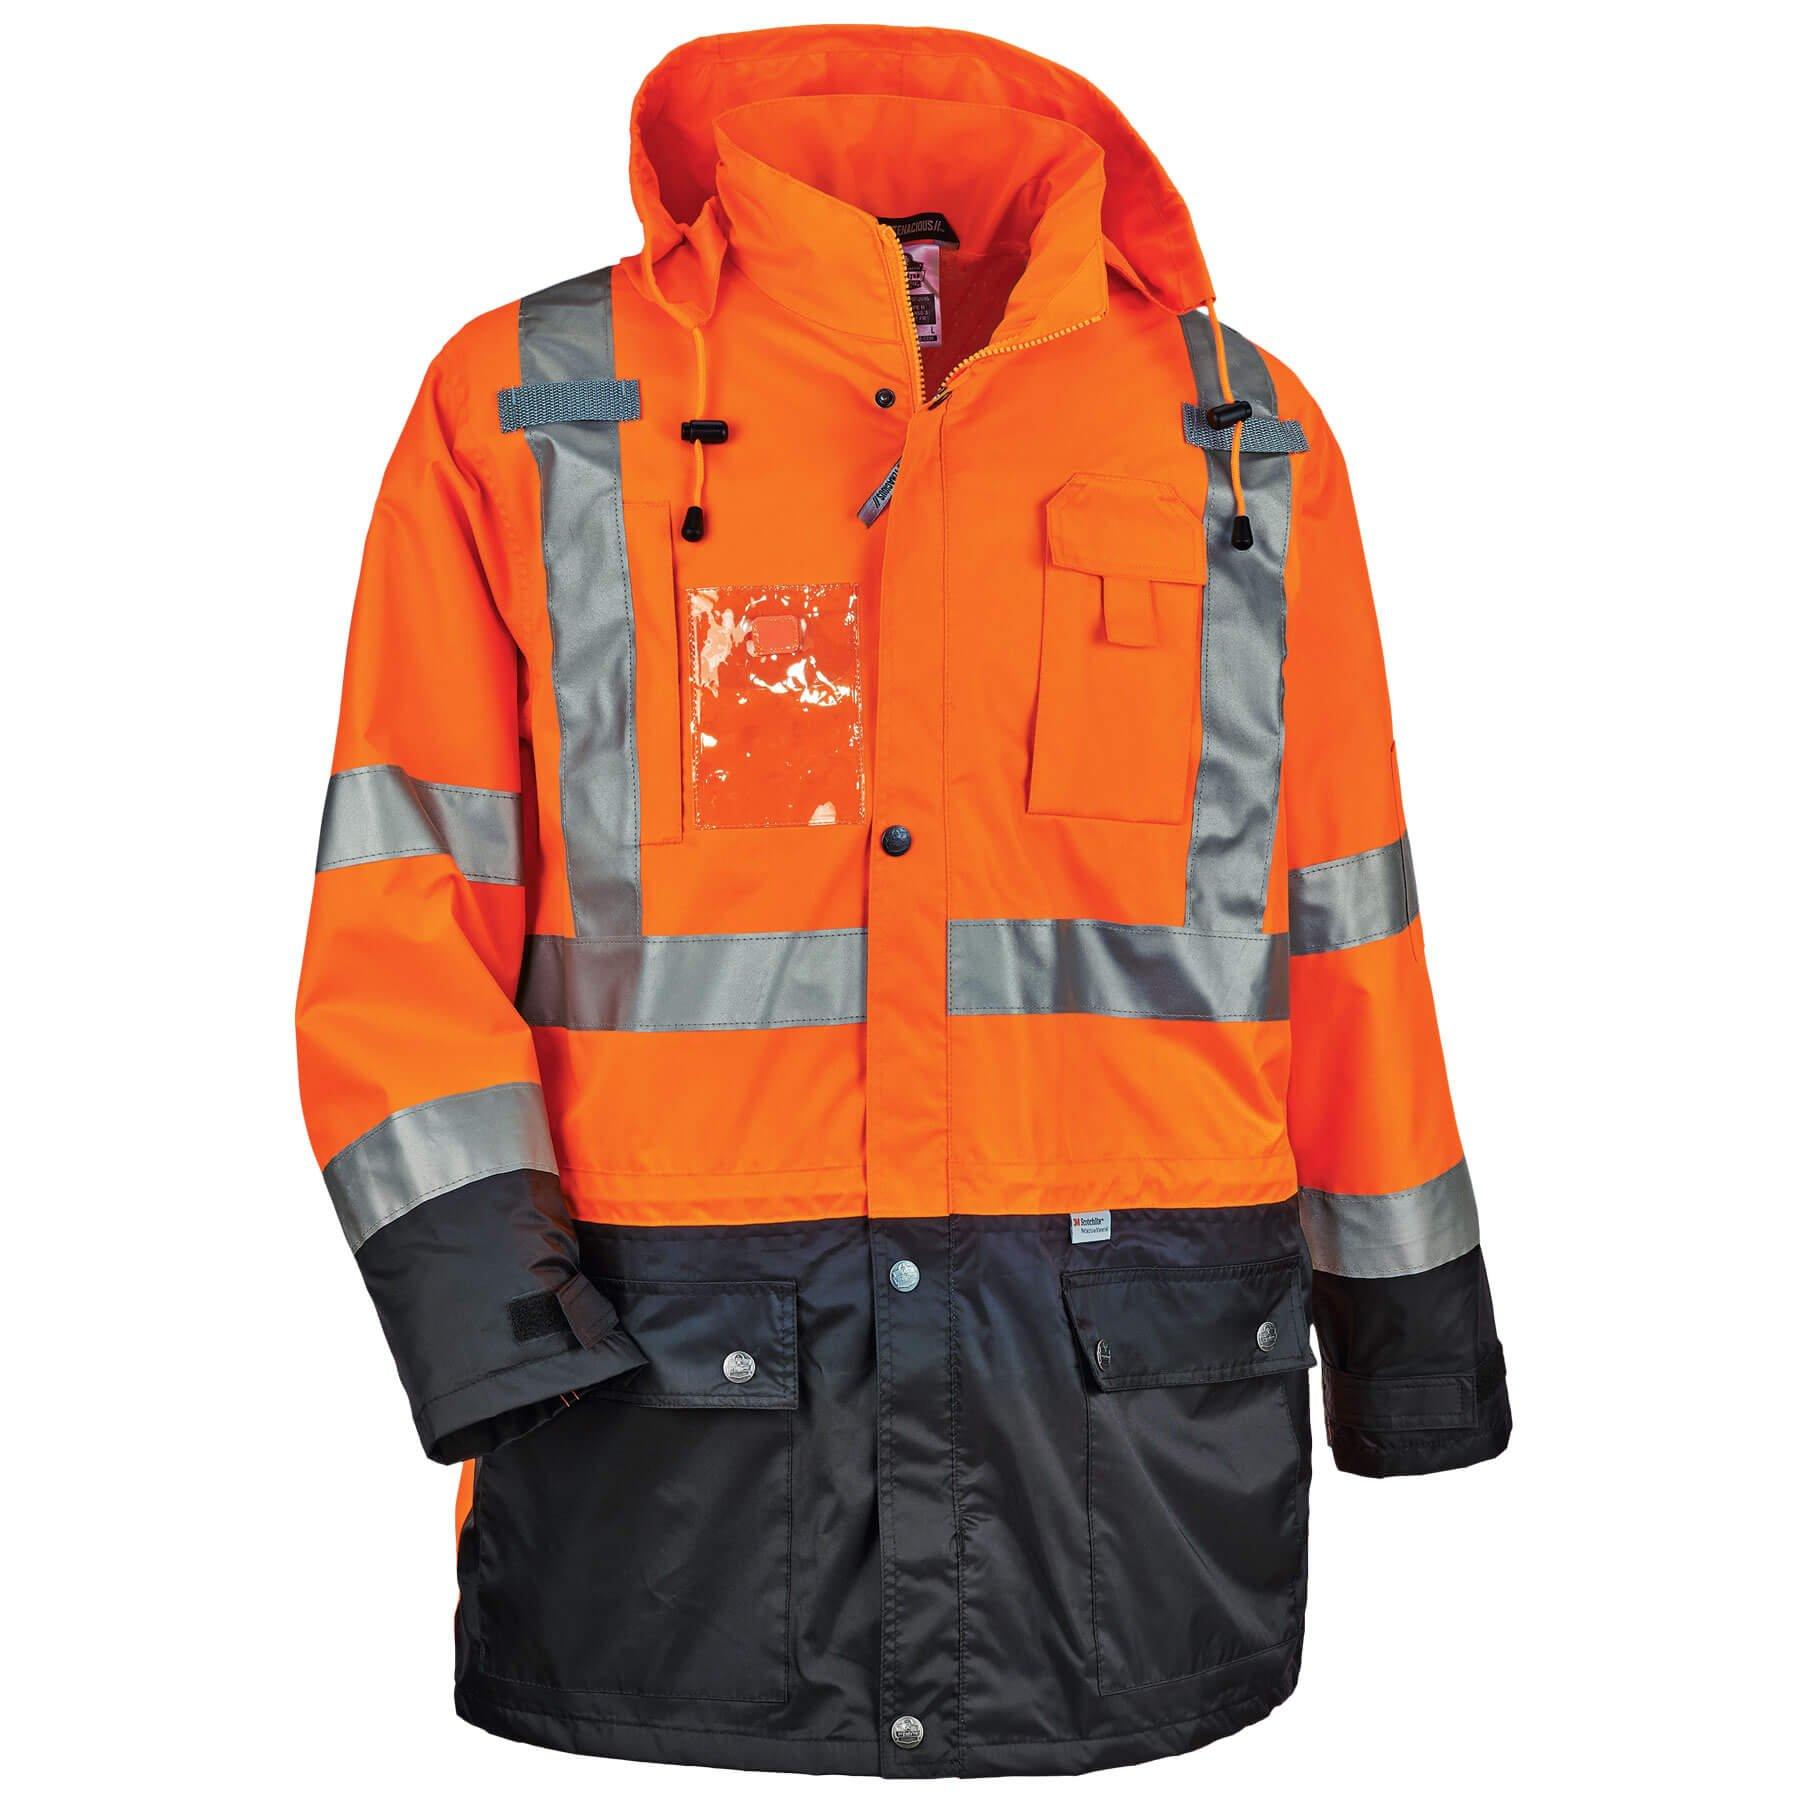 Ergodyne Glowear 8386 High Visibility Reflective Outer Rain Shell Jacket X Large Orange